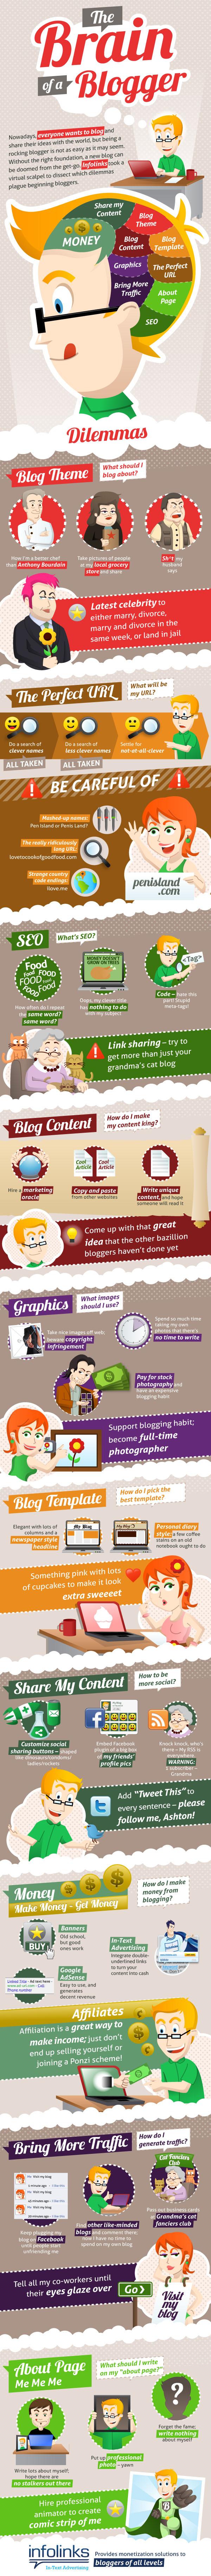 the Blogger Brain